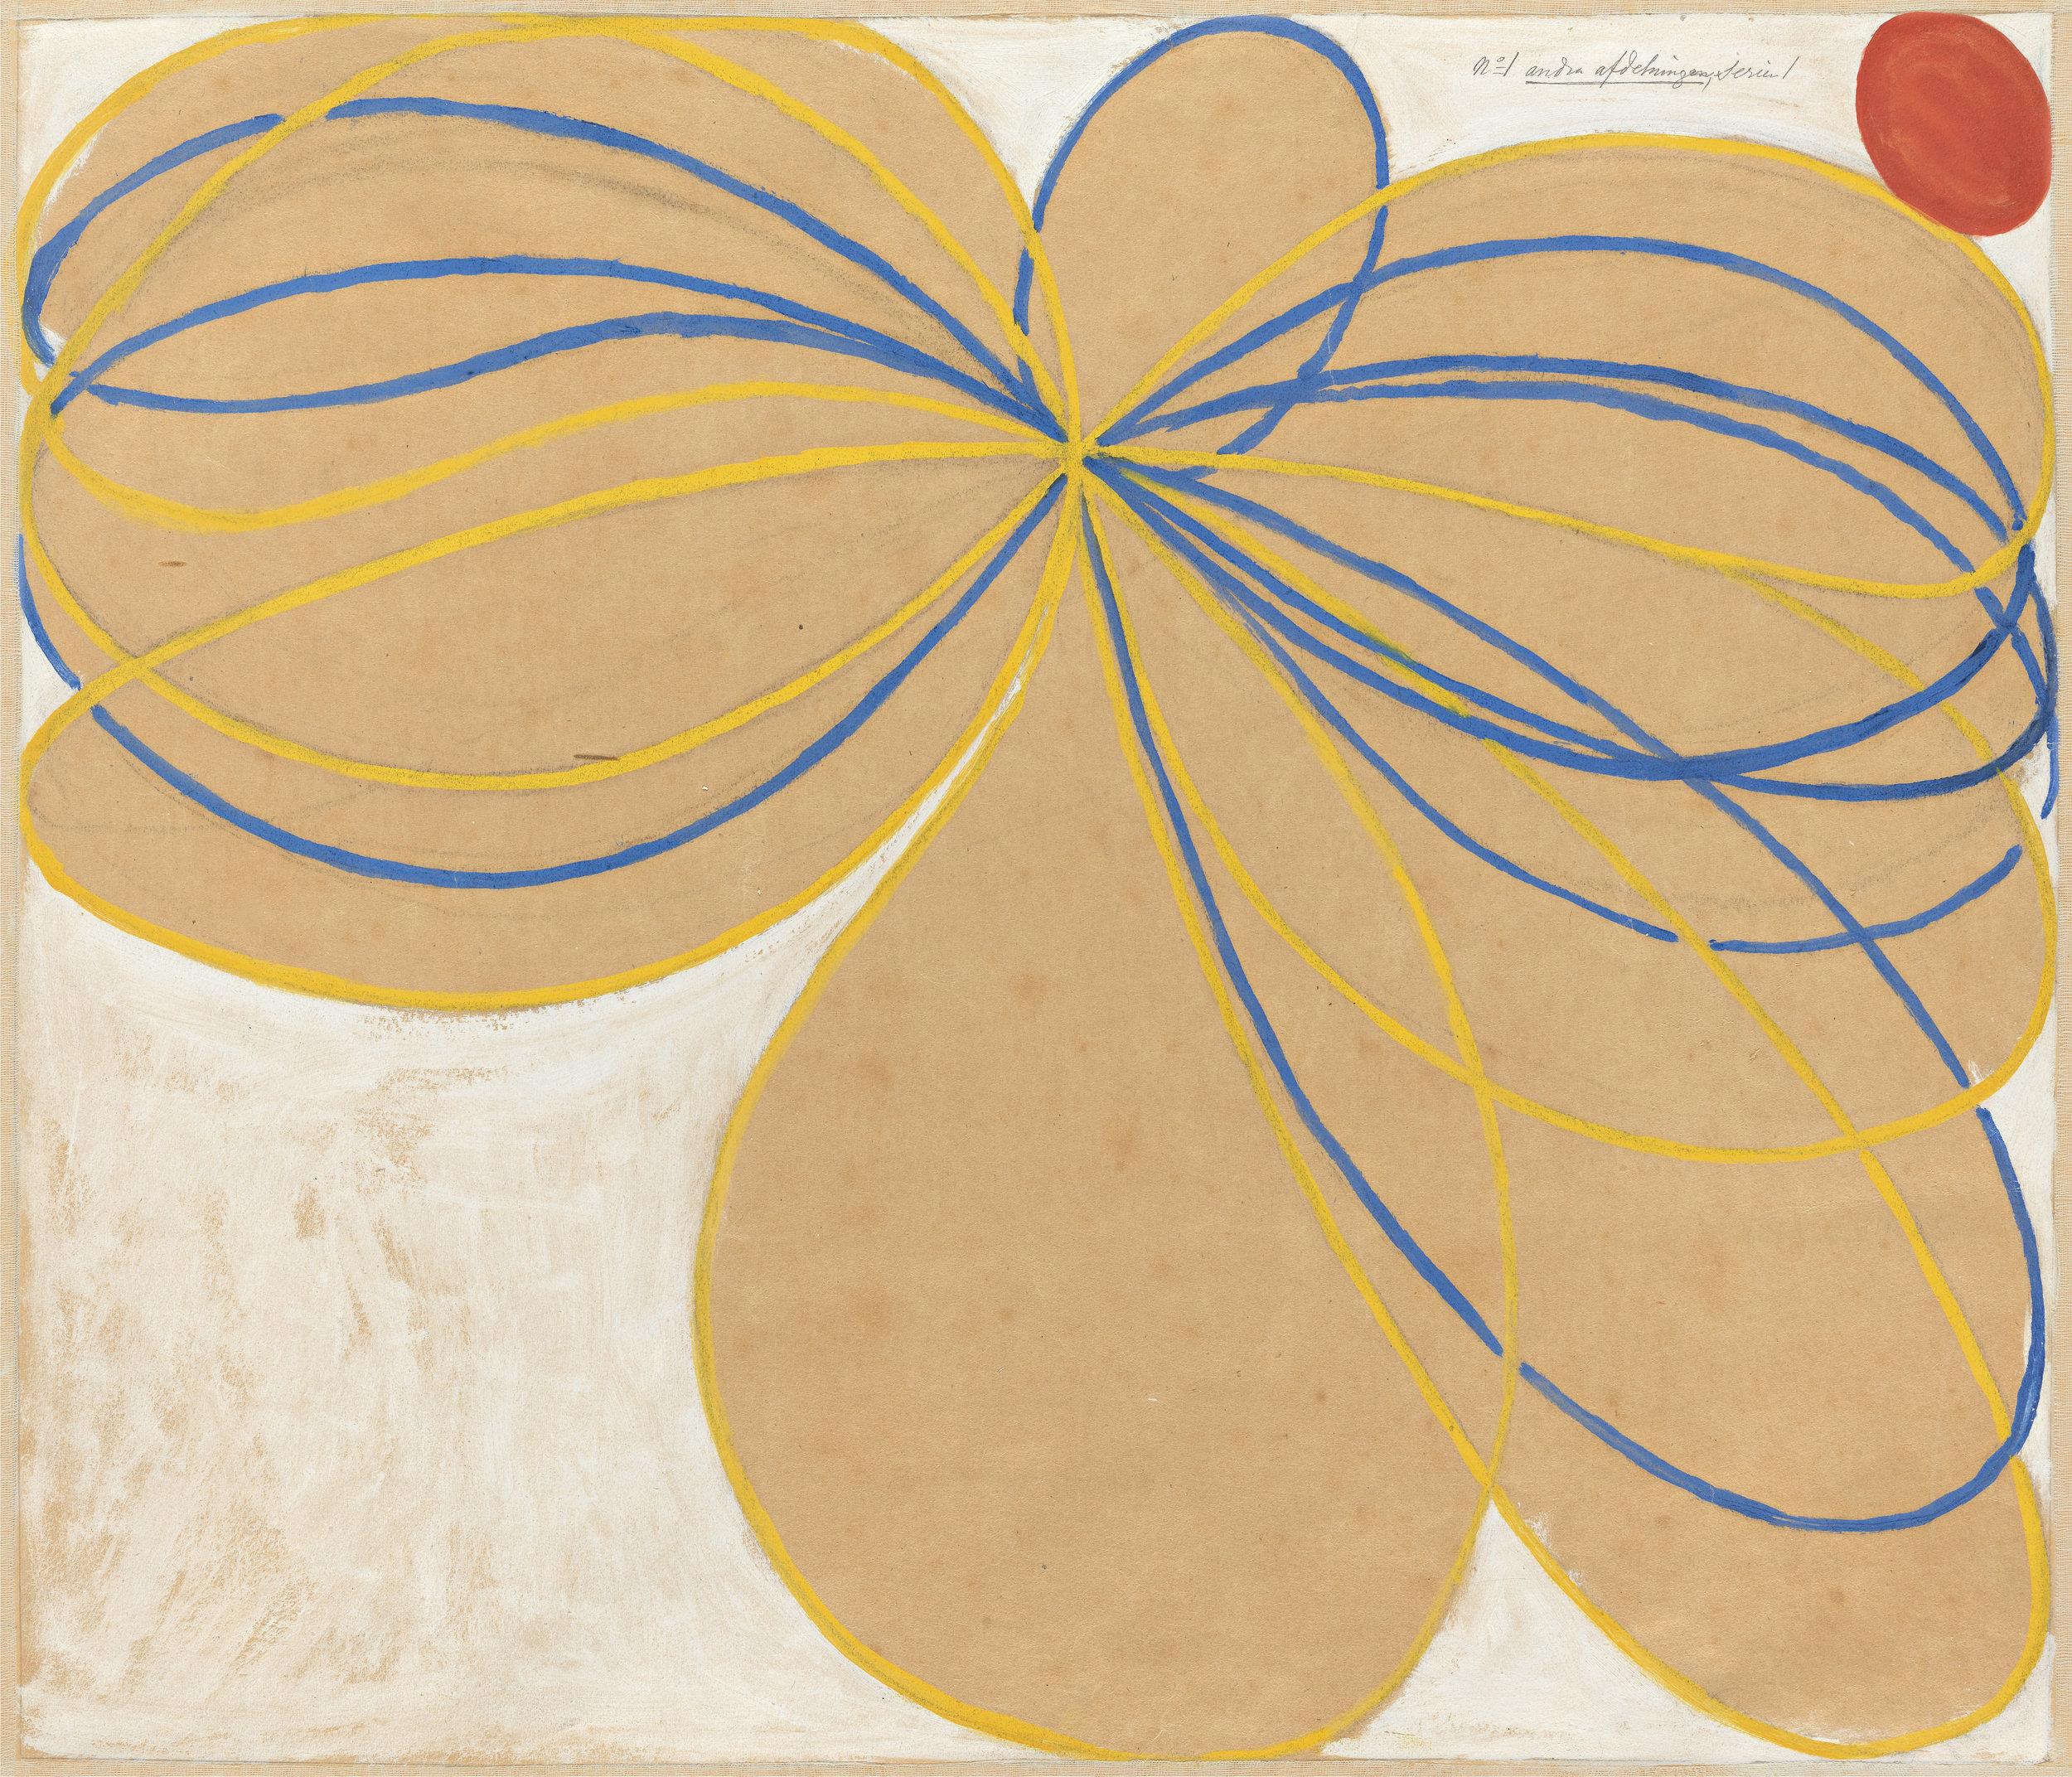 Hilma af Klint,  Group V, The Seven-Pointed Star, No. 1 n ( Grupp V, Sjustjärnan, nr 1 ), 1908, from  The WUS/Seven-Pointed Star Series  ( Serie WUS/Sjustjärnan ), Tempera, gouache and graphite on paper mounted on canvas, 62.5 x 76 cm, The Hilma af Klint Foundation, Stockholm Photo: Albin Dahlström, the Moderna Museet, Stockholm